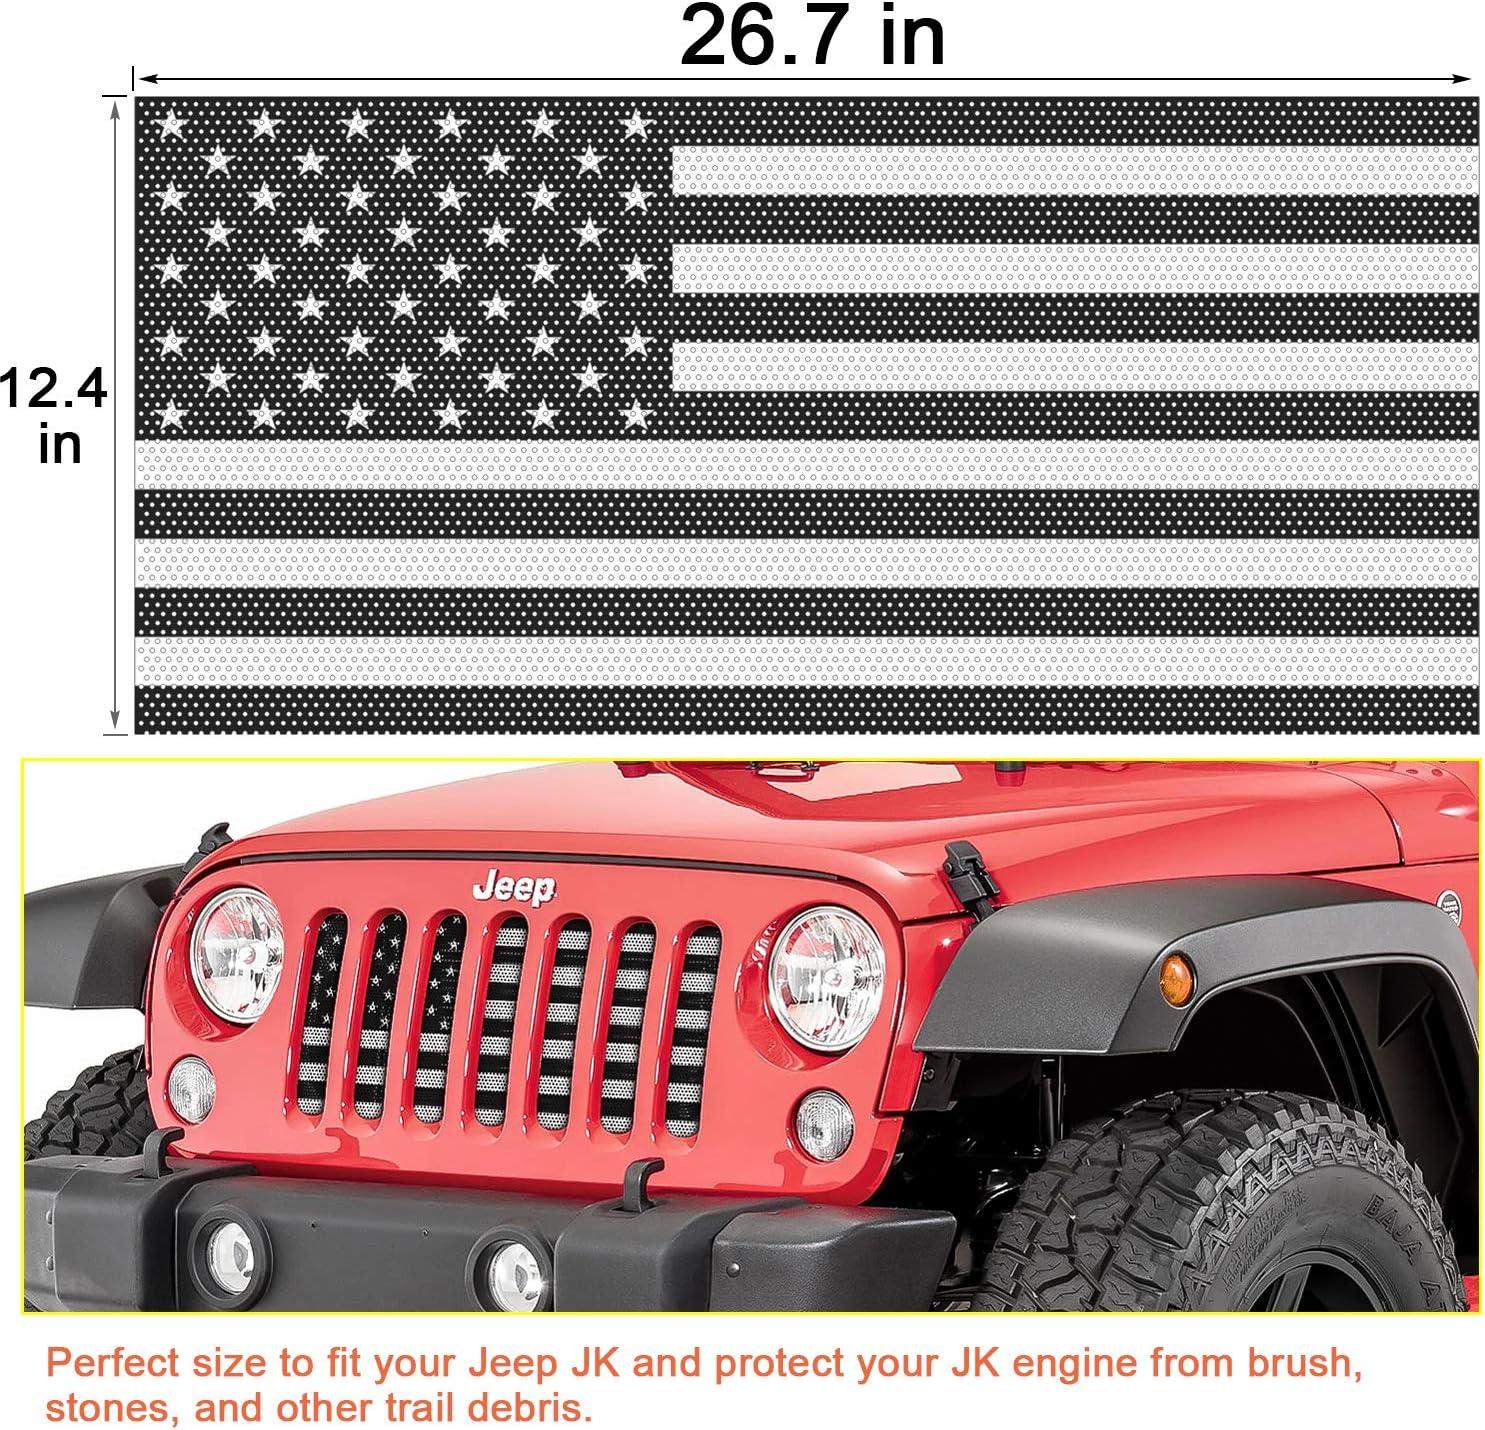 Danti Front Grille Insert Black /& White America Flag Mesh Grille Insert fit for Jeep JK /& Wrangler Unlimited 2007-2018